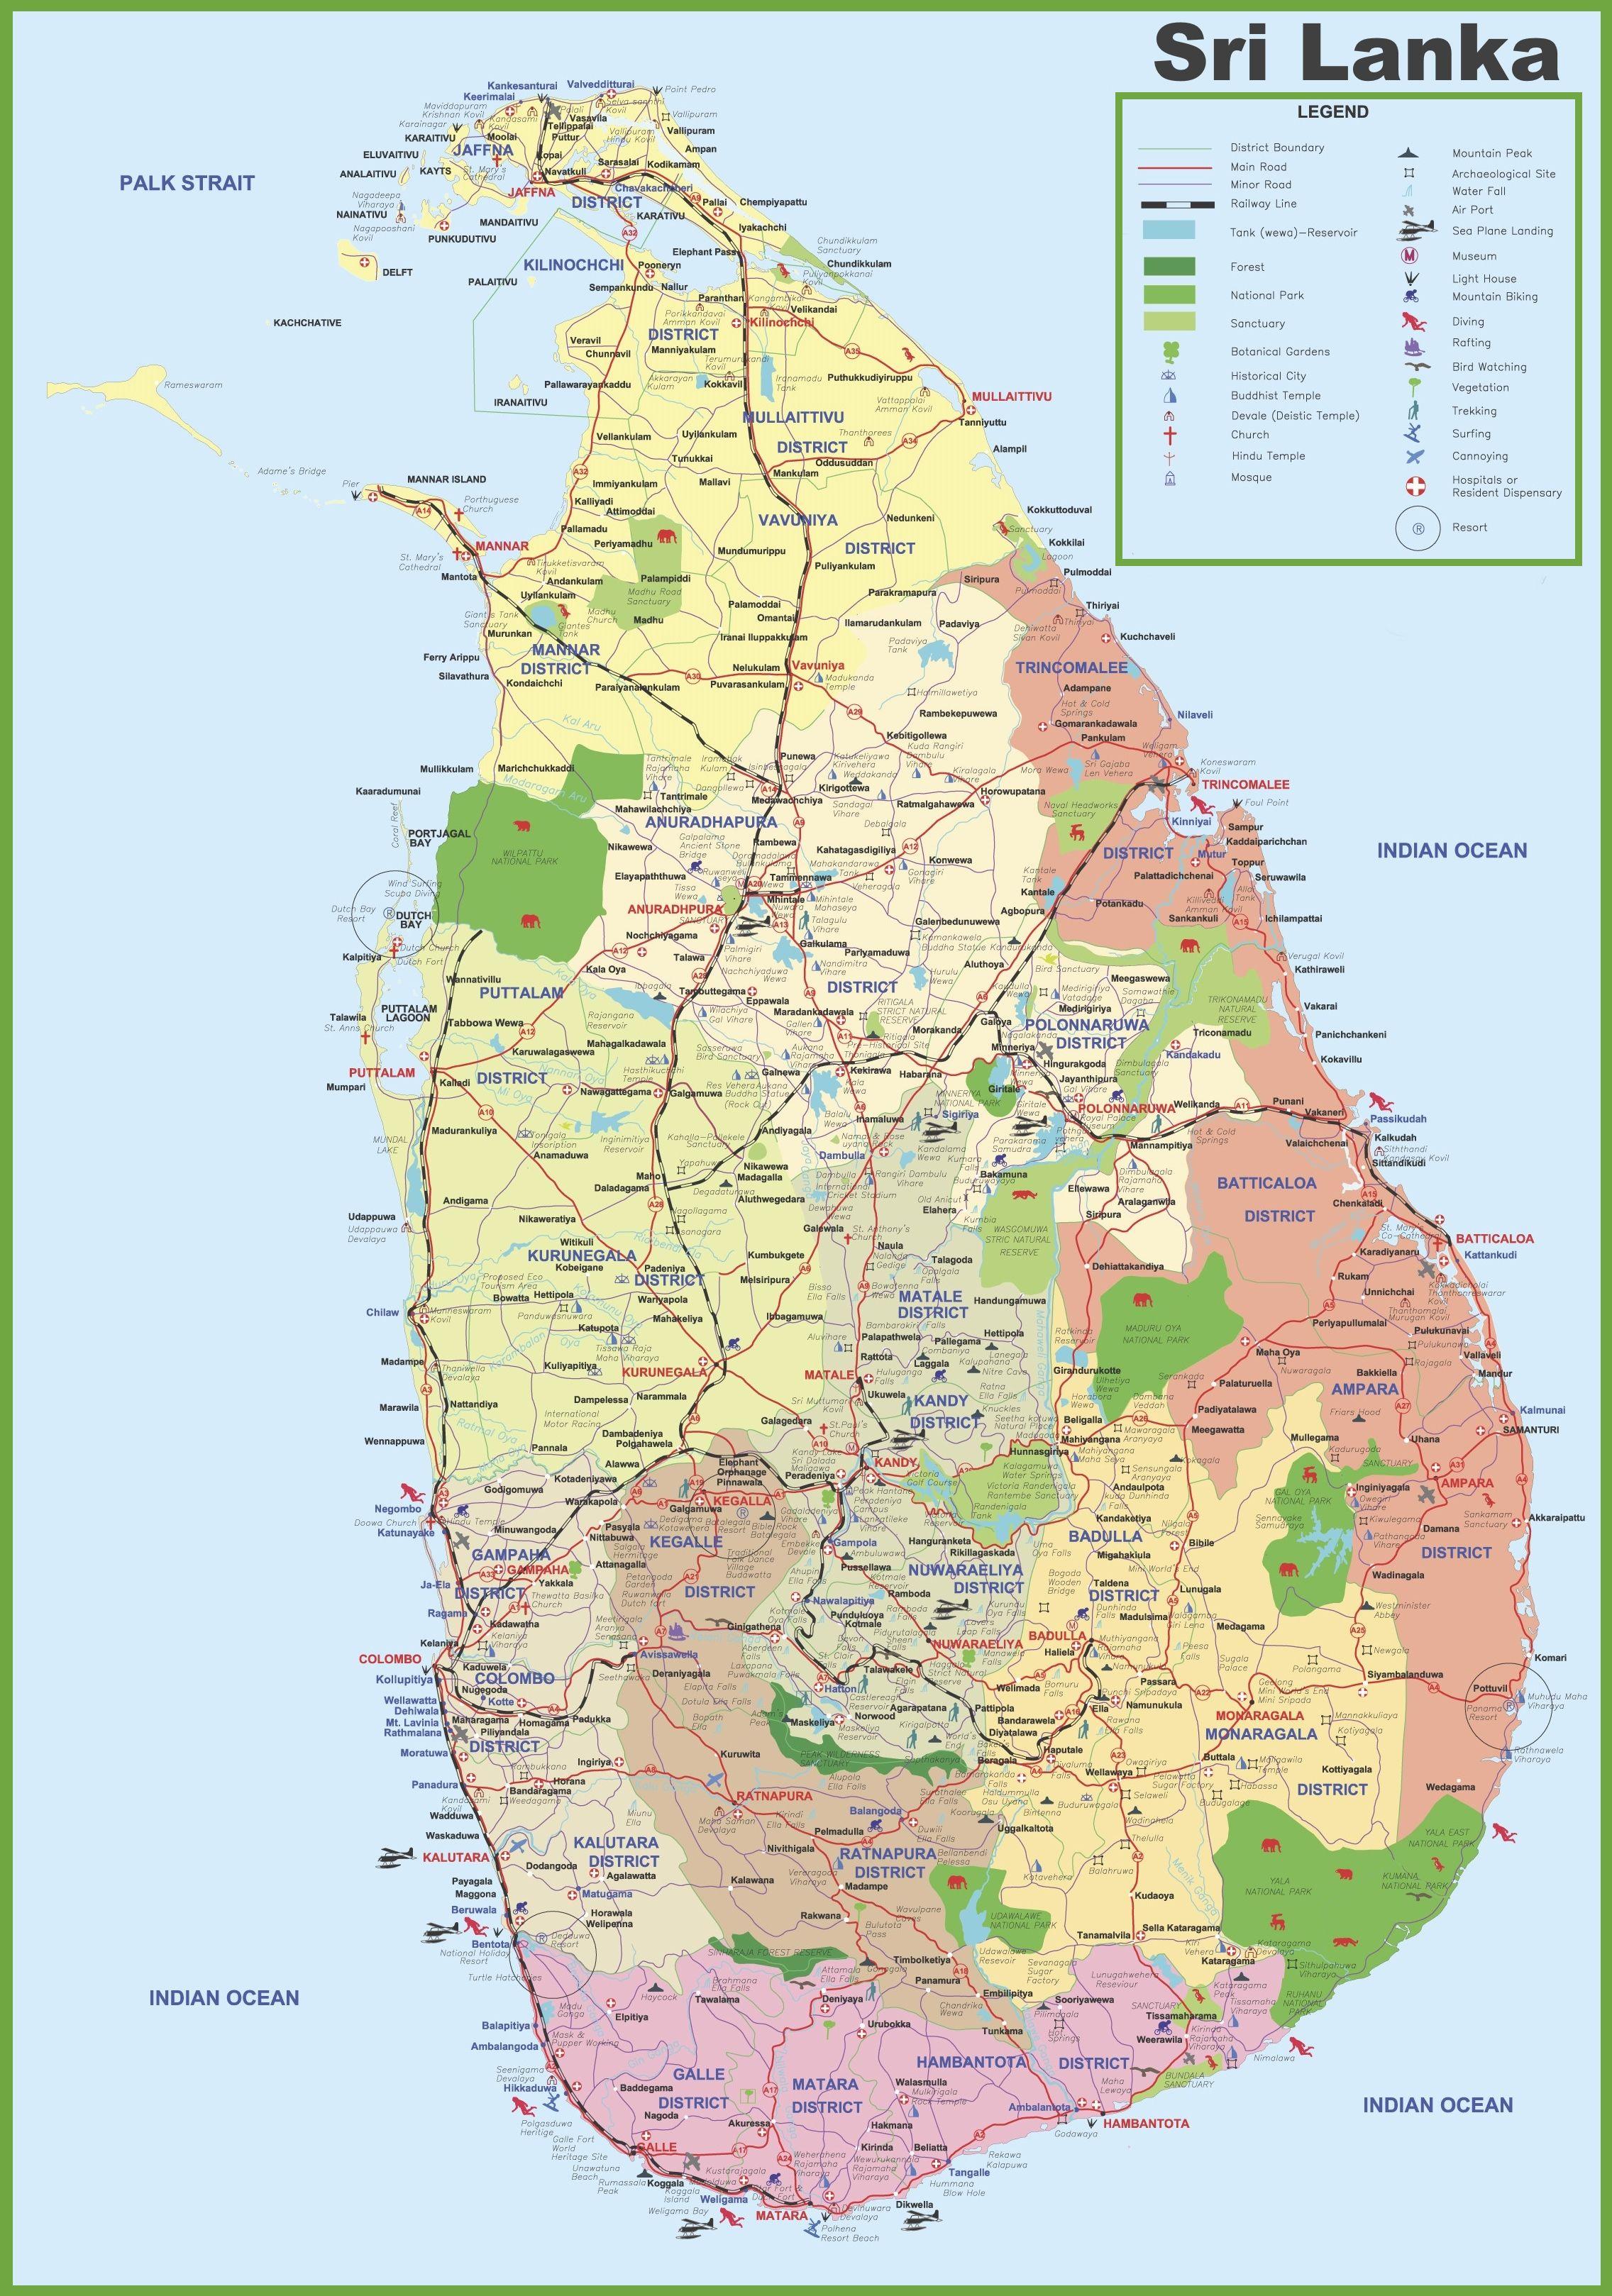 Tourist map of Sri Lanka